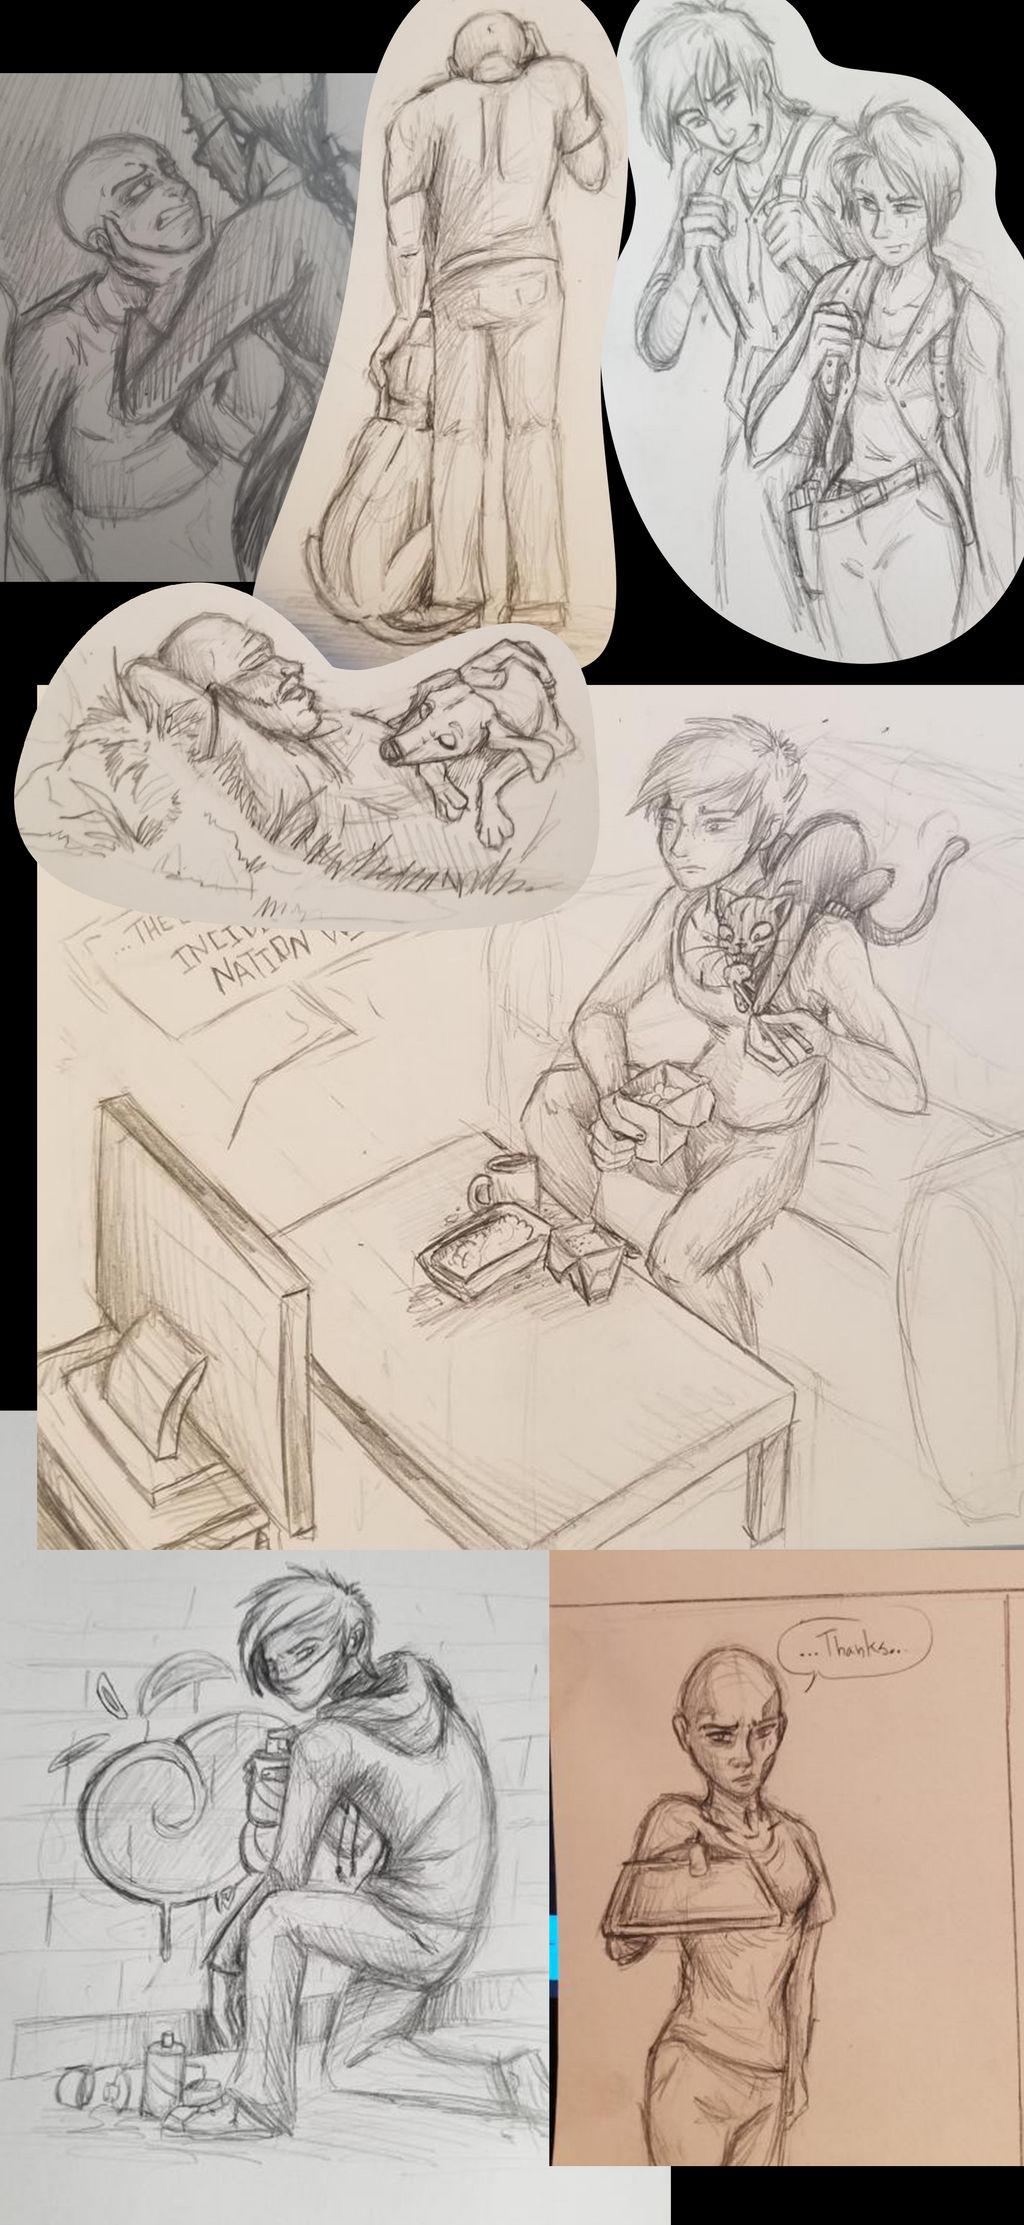 Sketch Dump from Zombie Apoc RP UZA